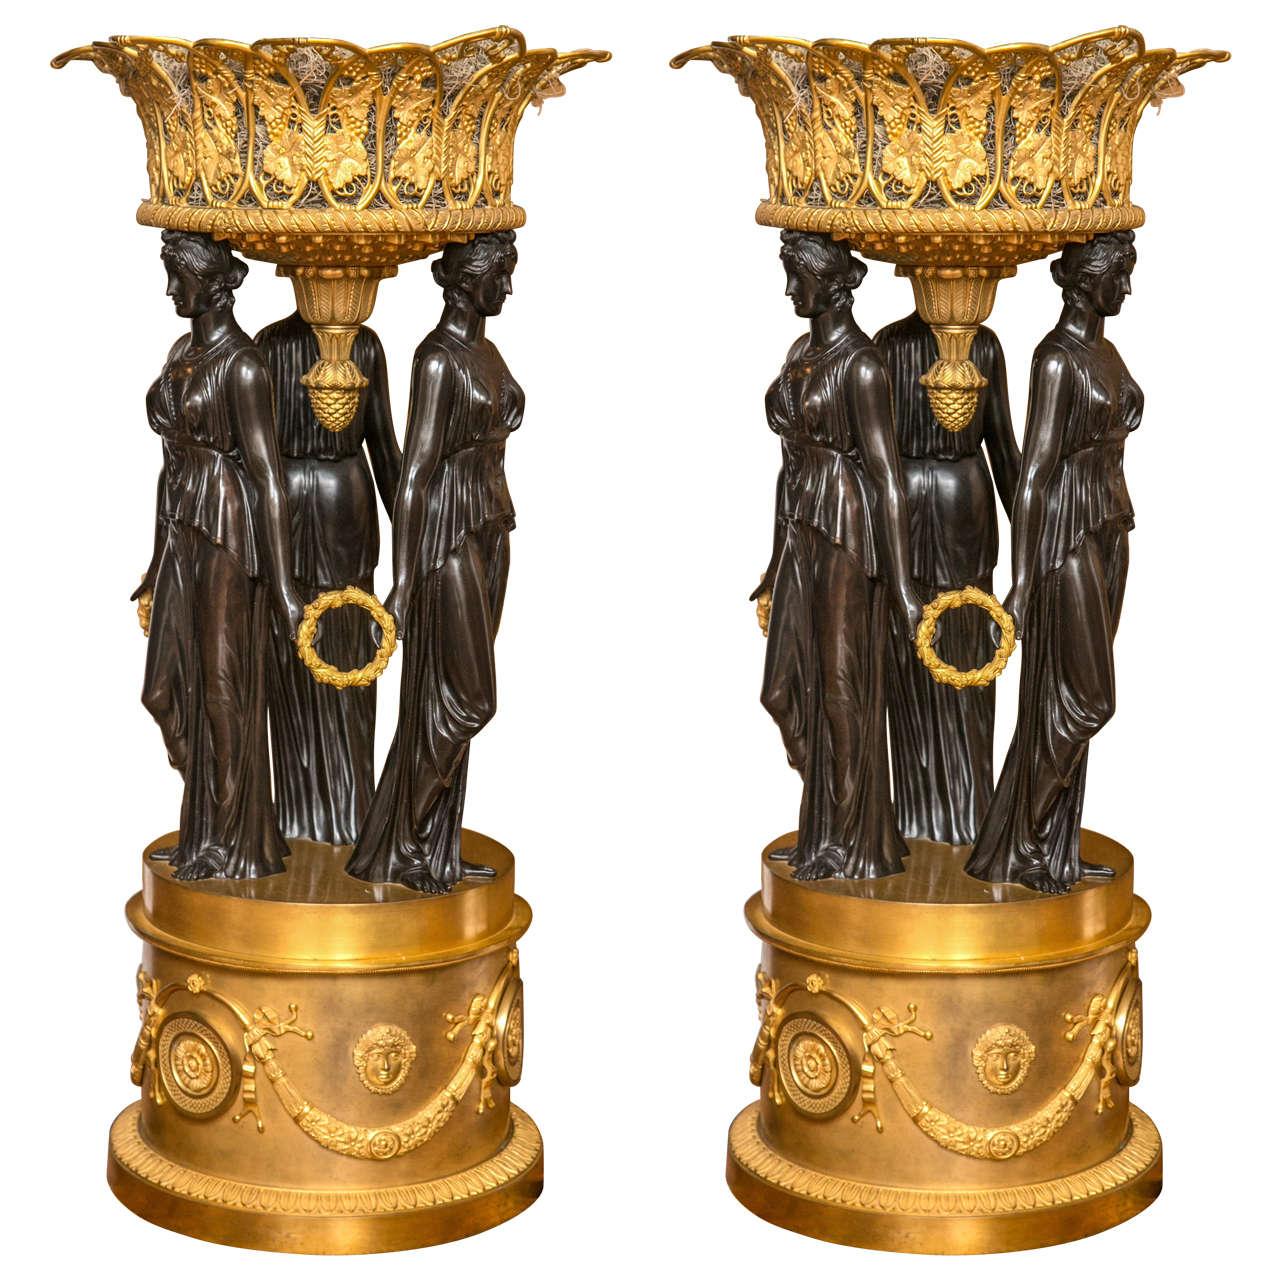 Pair of Palatial Antique Dor  and Patented Bronze Figural Planters. Hobnail Green Elephant Planter Palm Beach Ceramic Plant Pot